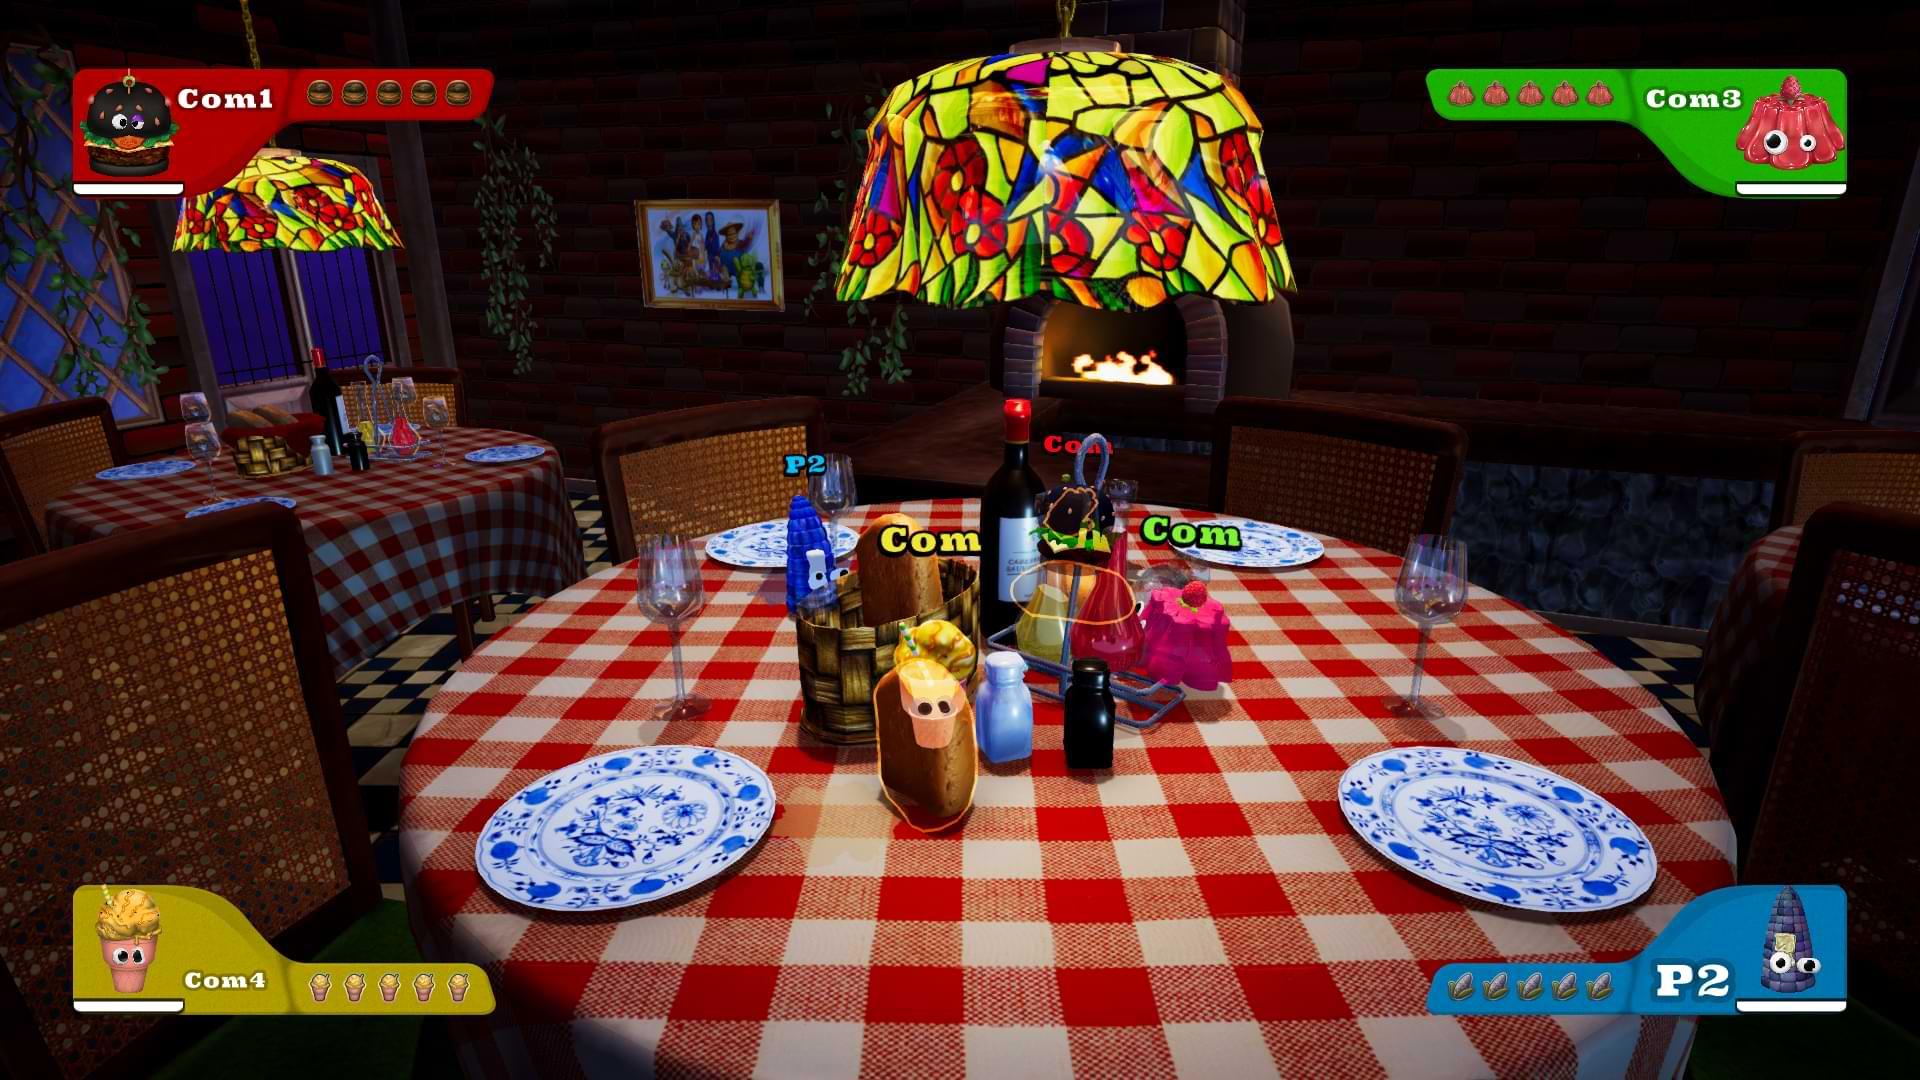 Lunch A Palooza - Dining